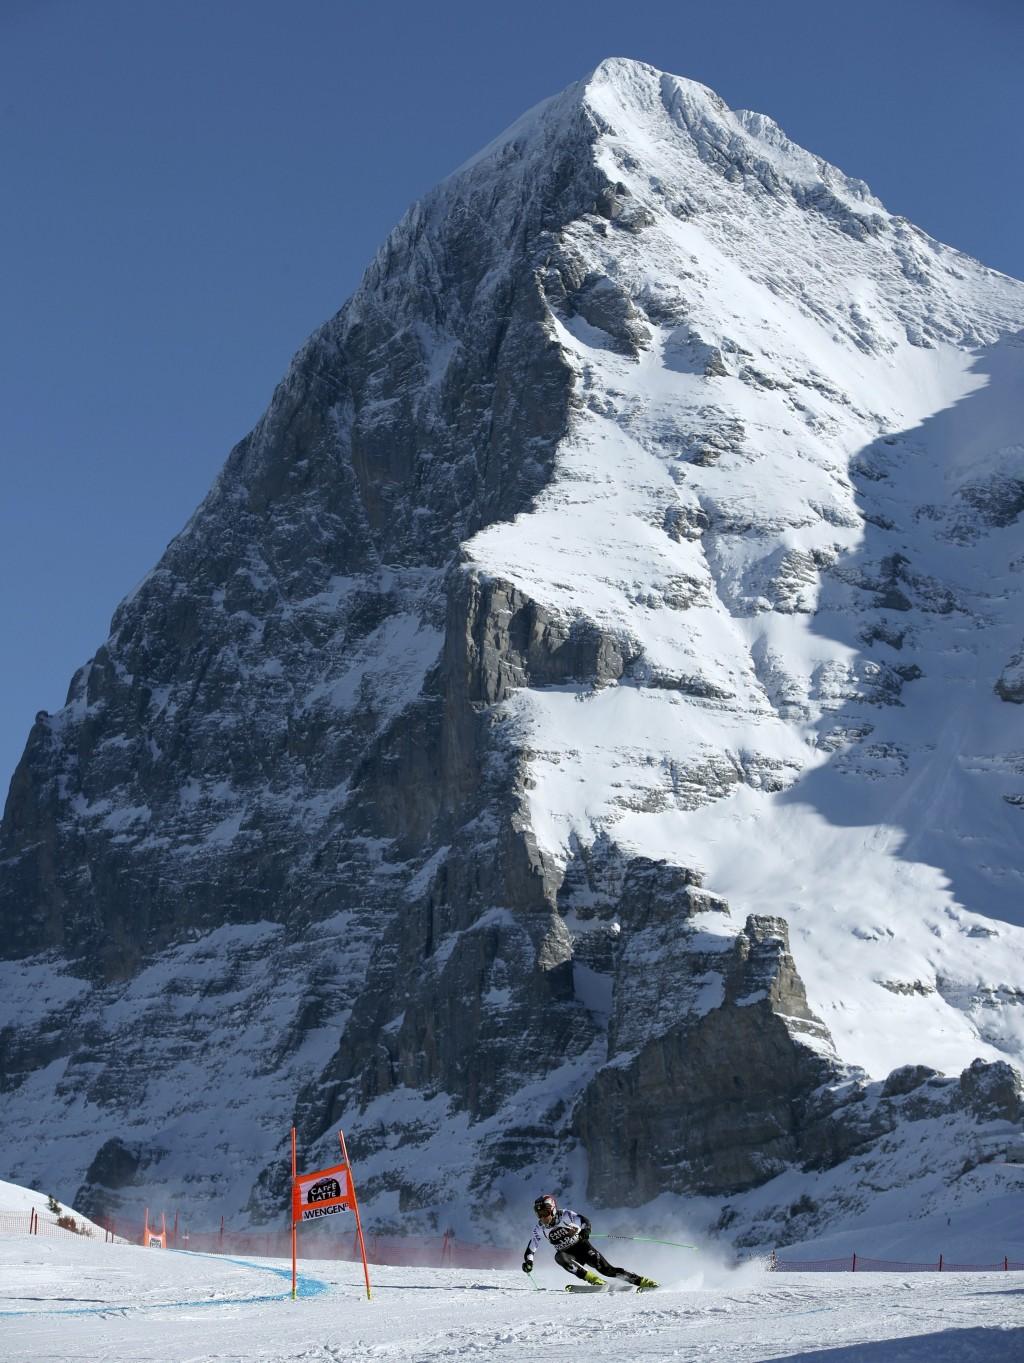 United States' Steven Nyman competes during an alpine ski, men's World Cup downhill in Wengen, Switzerland, Saturday, Jan. 18, 2019. (AP Photo/Shinich